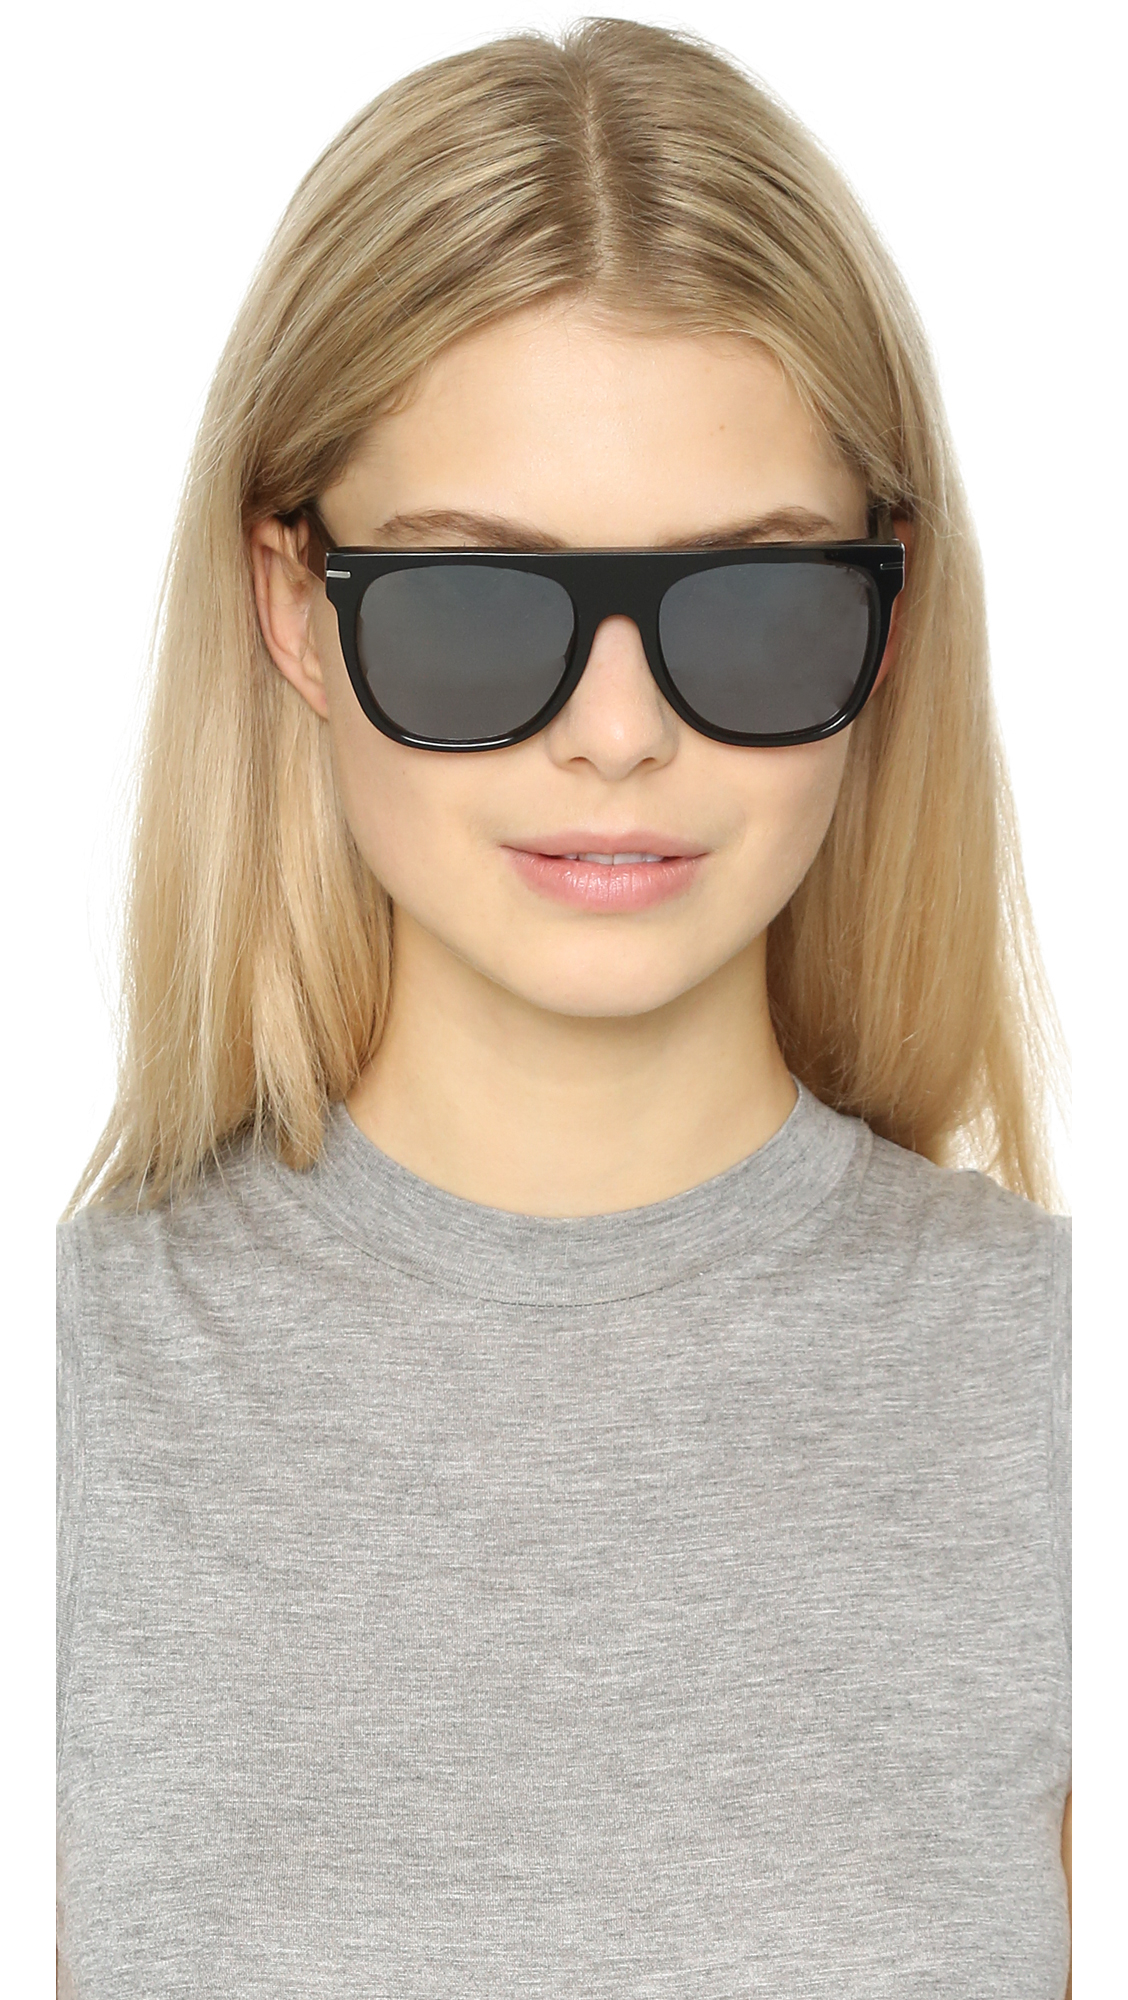 Retrosuperfuture Flat Top Triflect Sunglasses in Black/Black (Black)